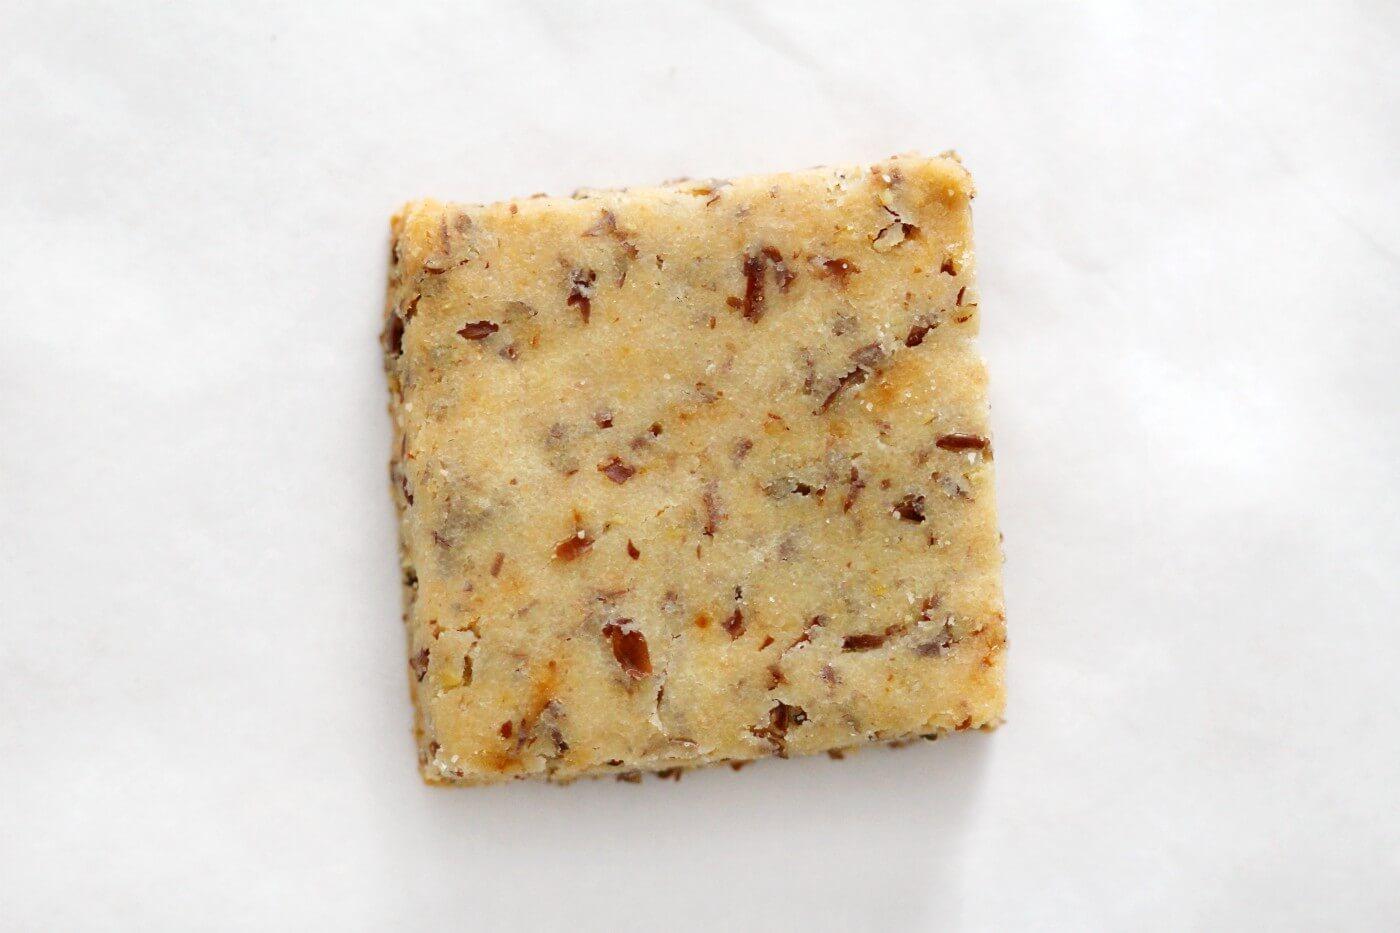 single gluten-free wheat thin cracker close-up